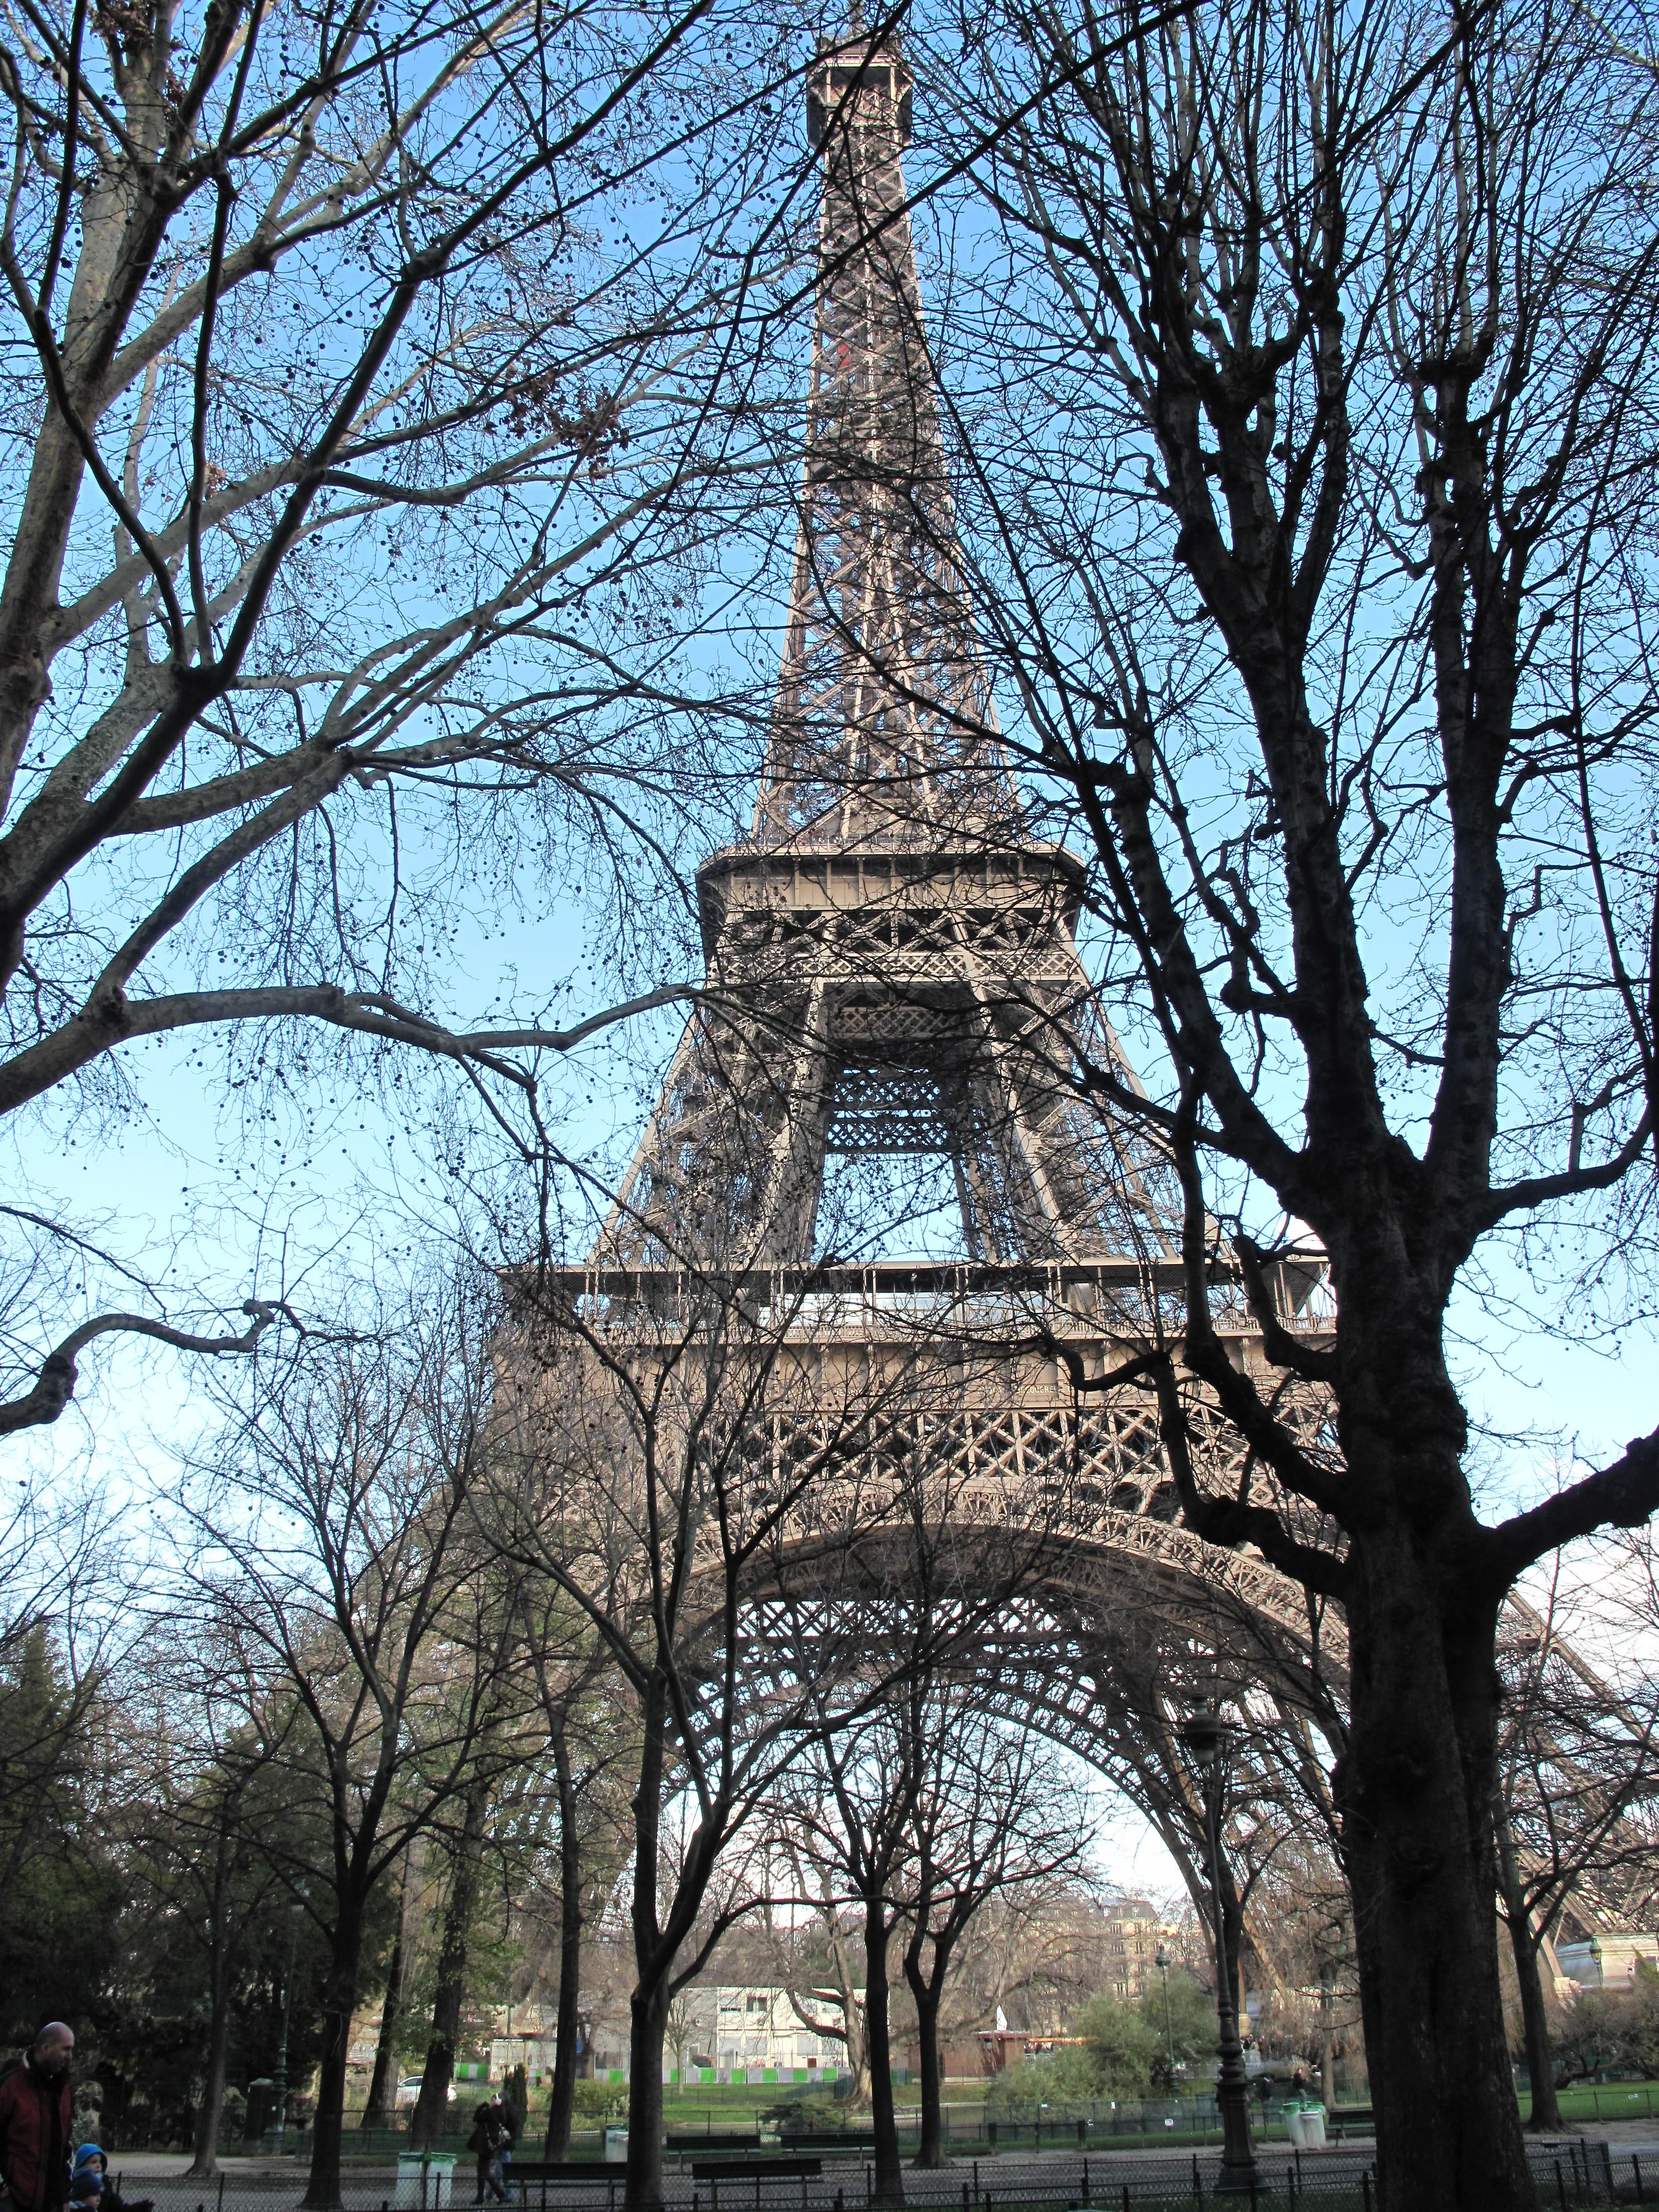 Free Images Tree Architecture Flower Eiffel Tower Paris